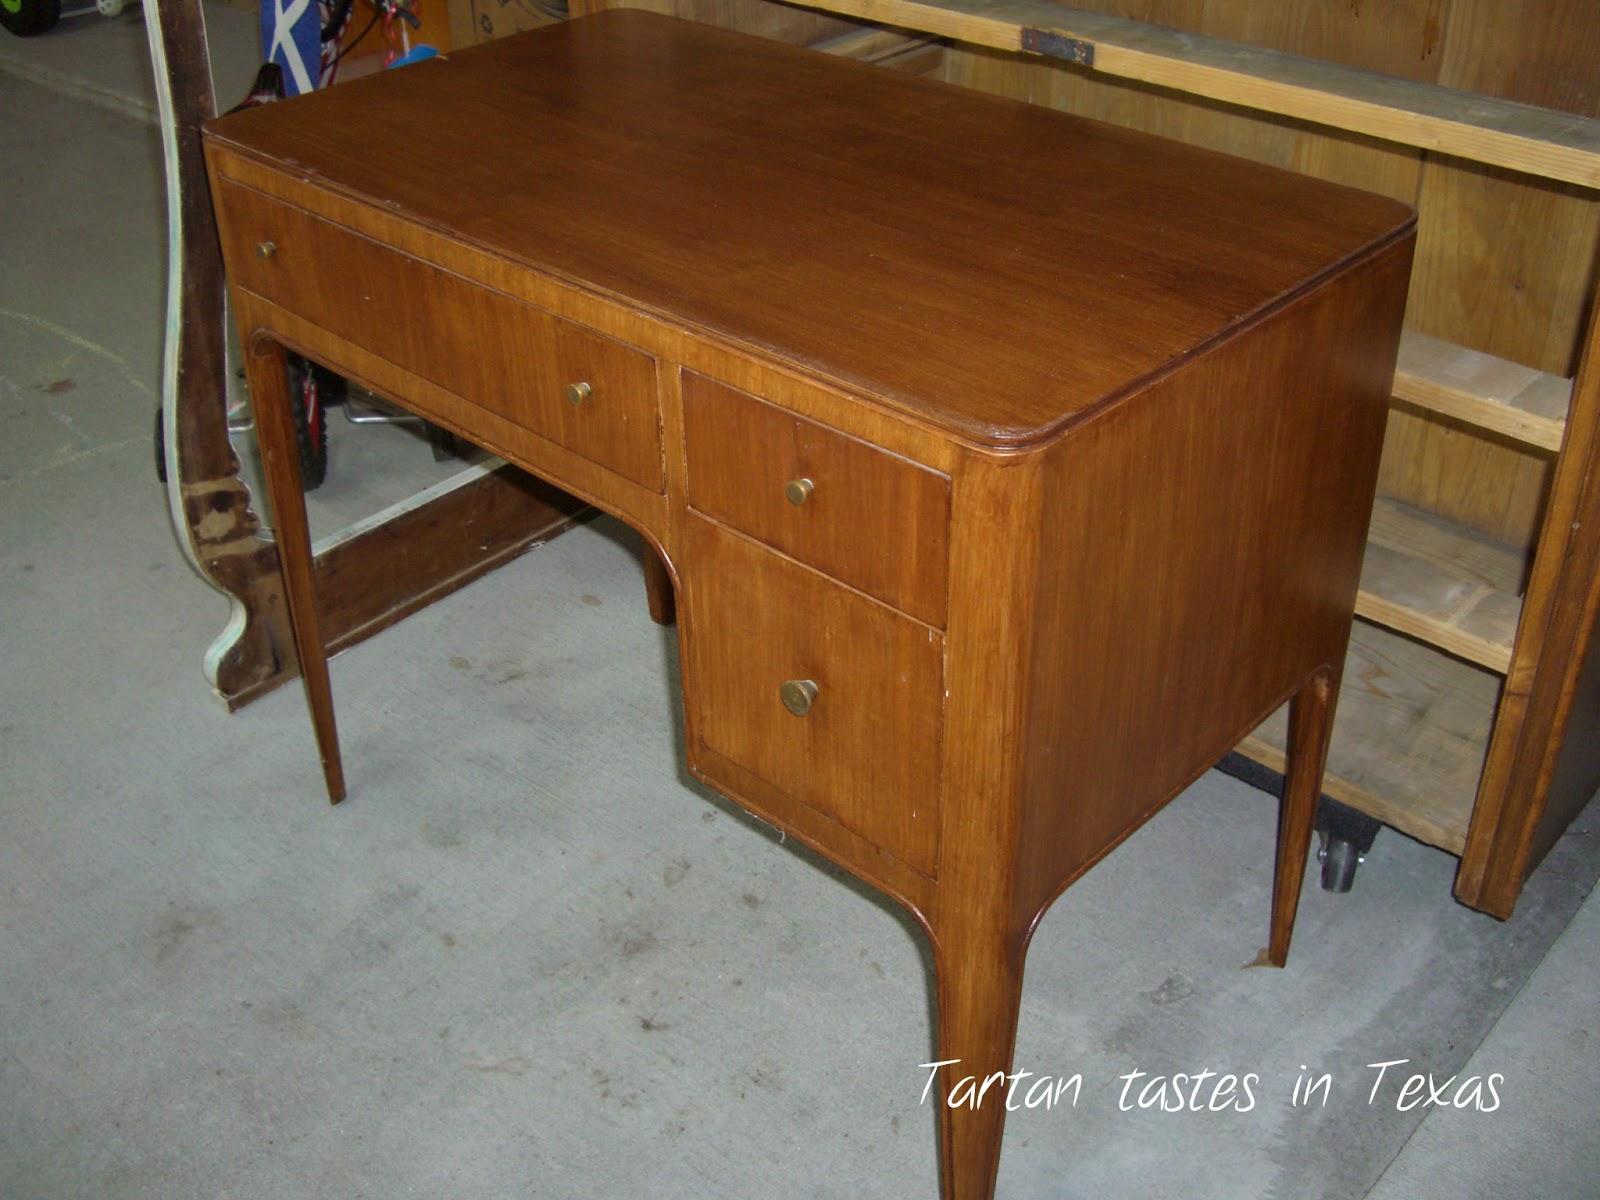 Tartan tastes in texas furniture friday the cute little for Cute vanity desk